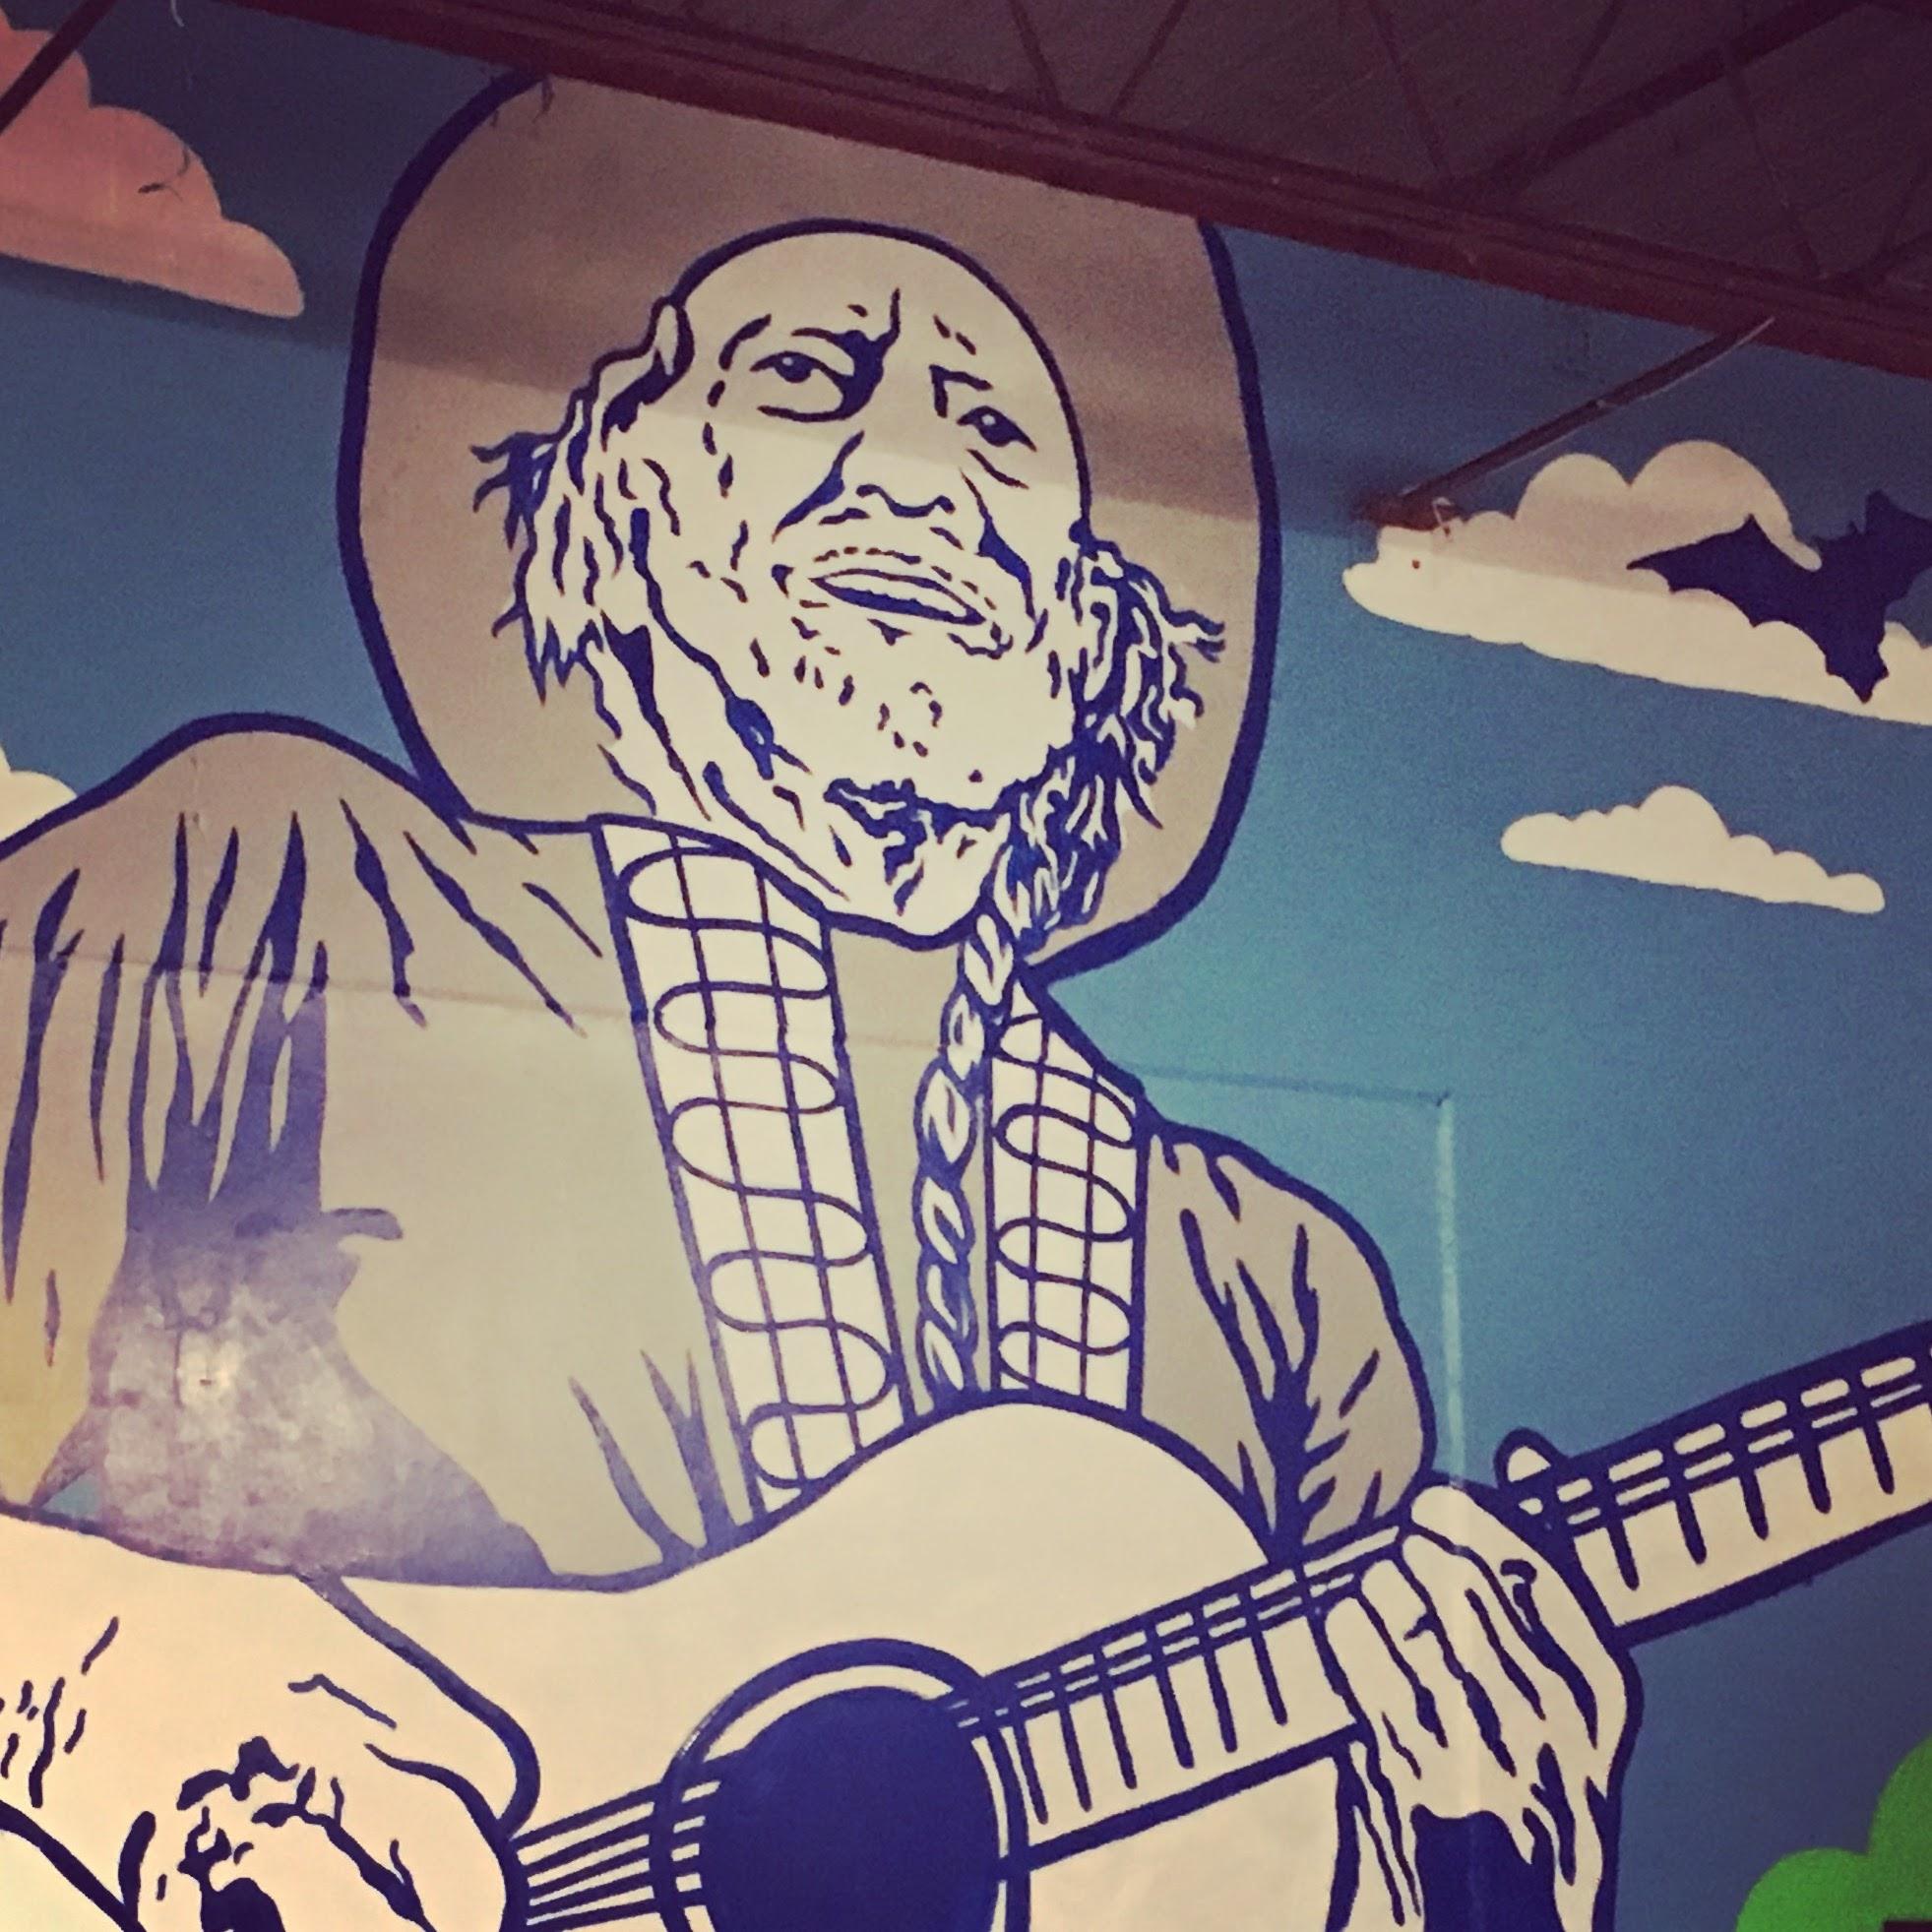 Dart'Em Up Nerf Gun Arena Mural, Austin